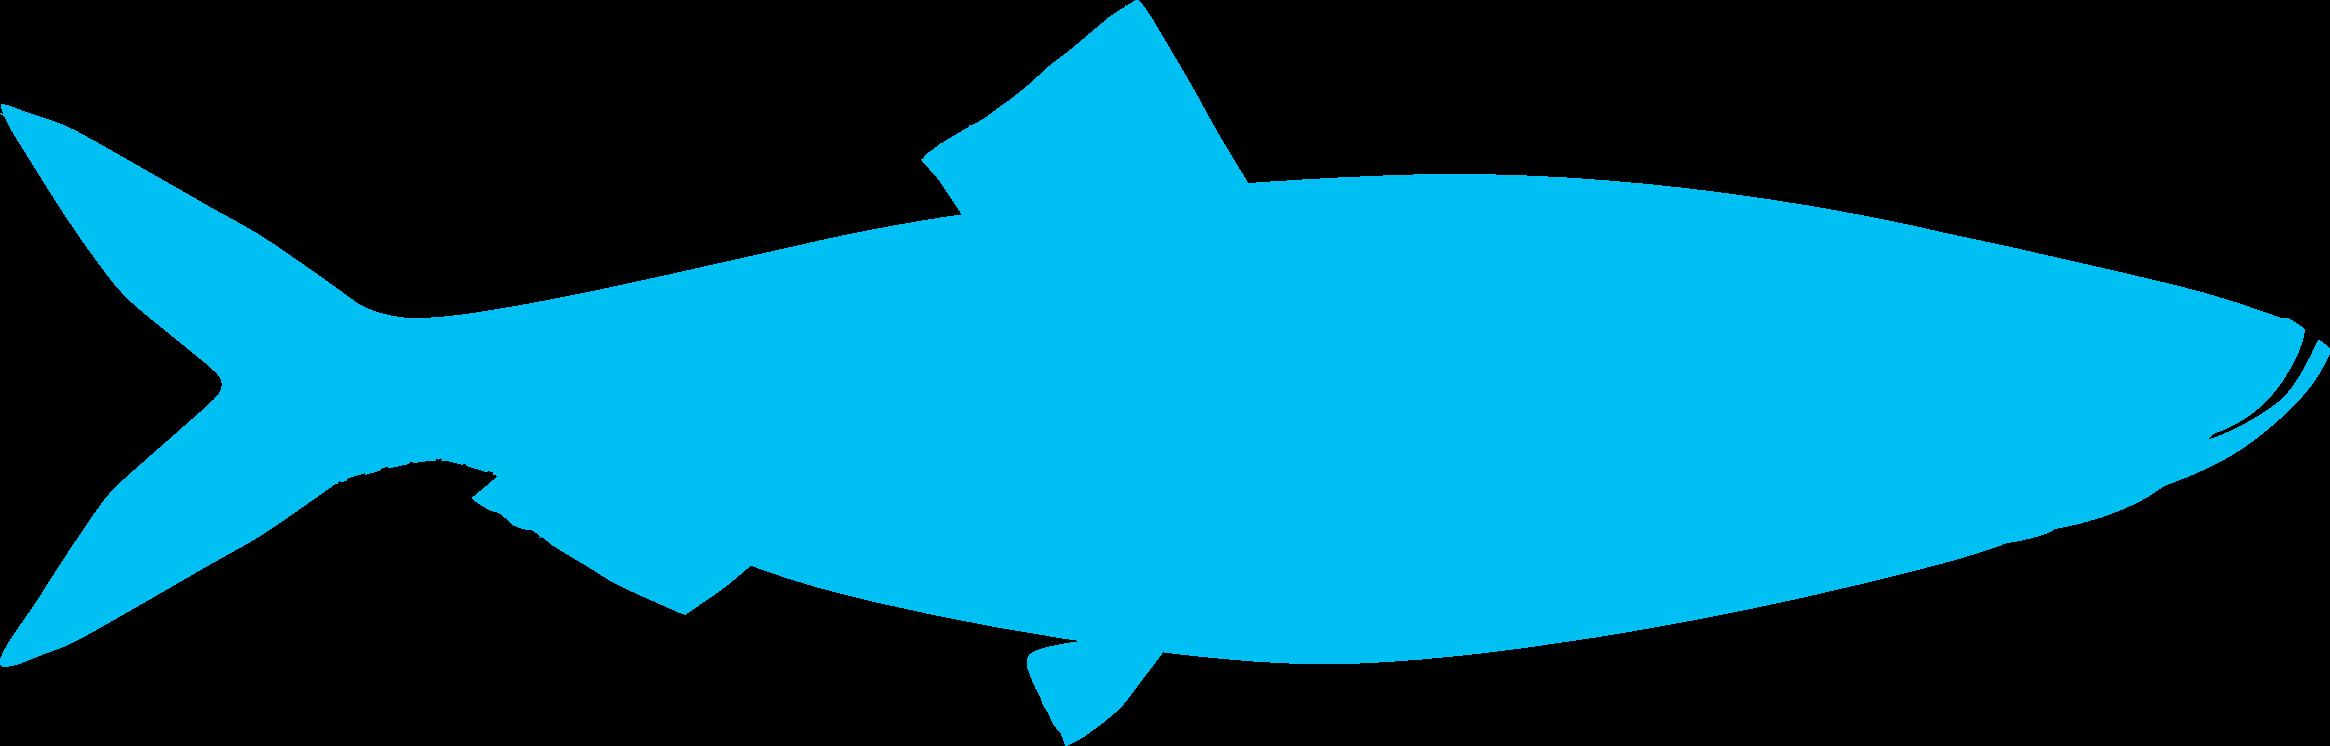 Image-Fish-herring-shape